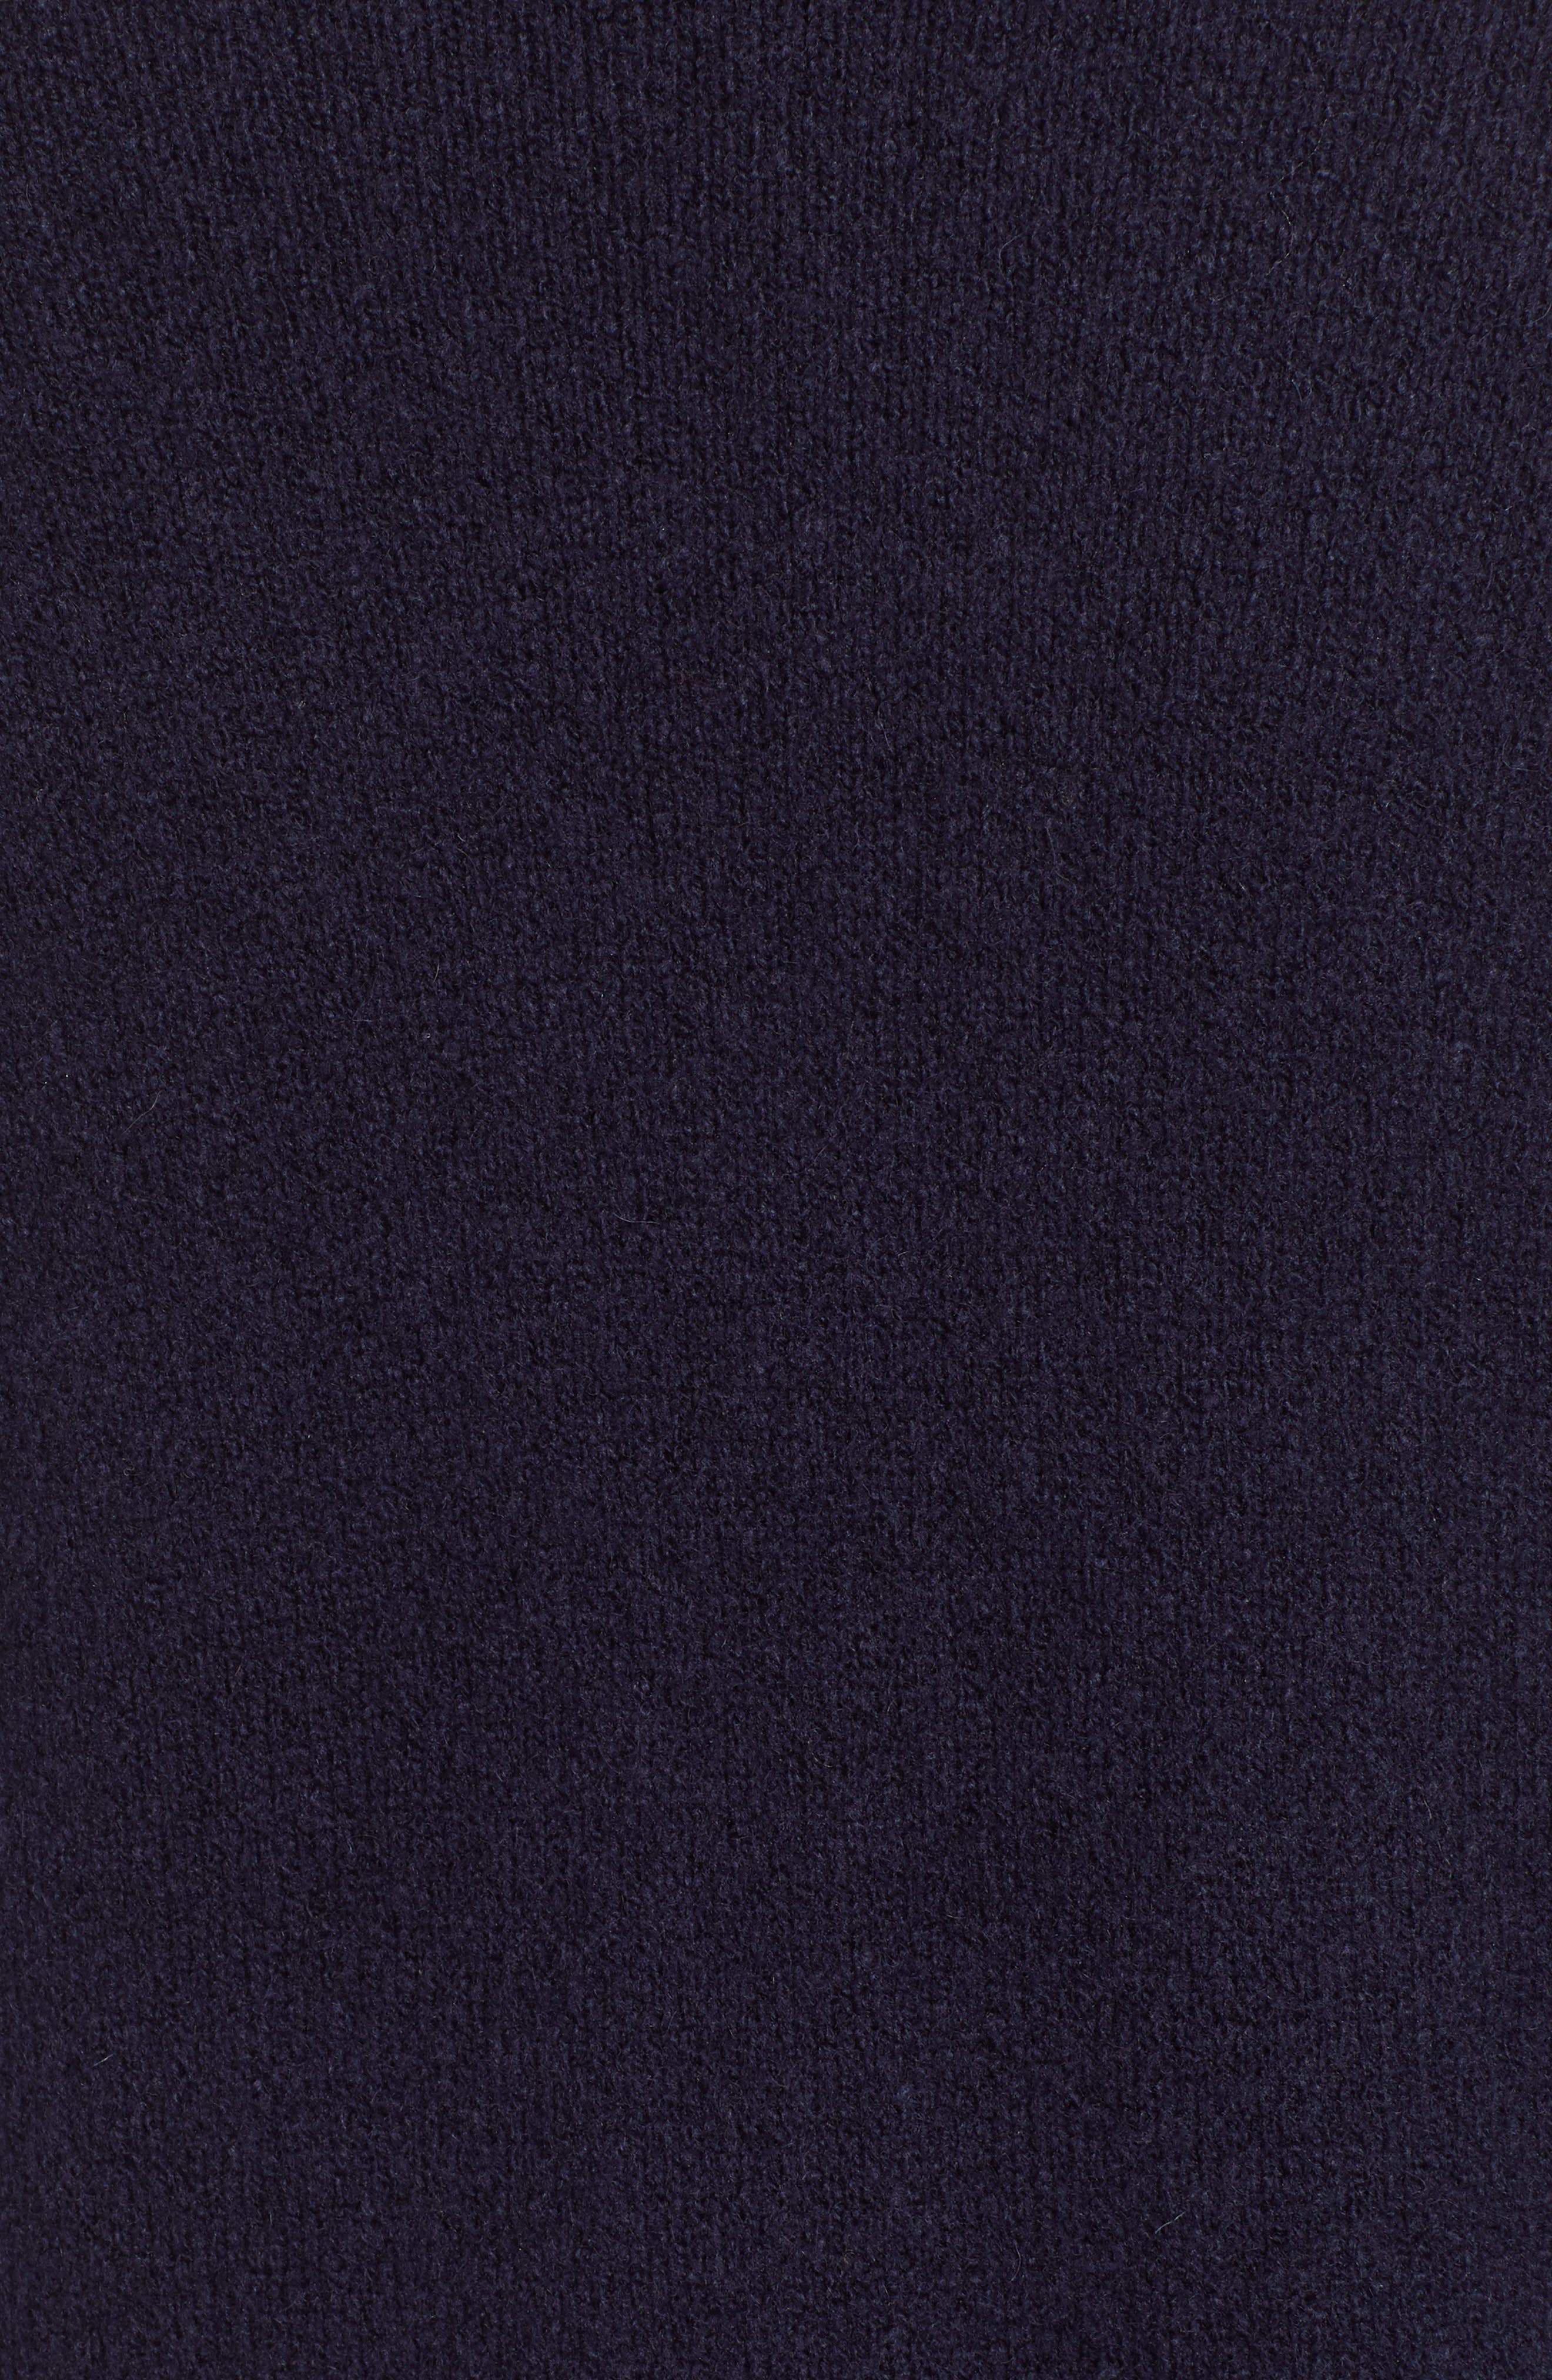 Shawl Collar Cardigan,                             Alternate thumbnail 5, color,                             NAVY